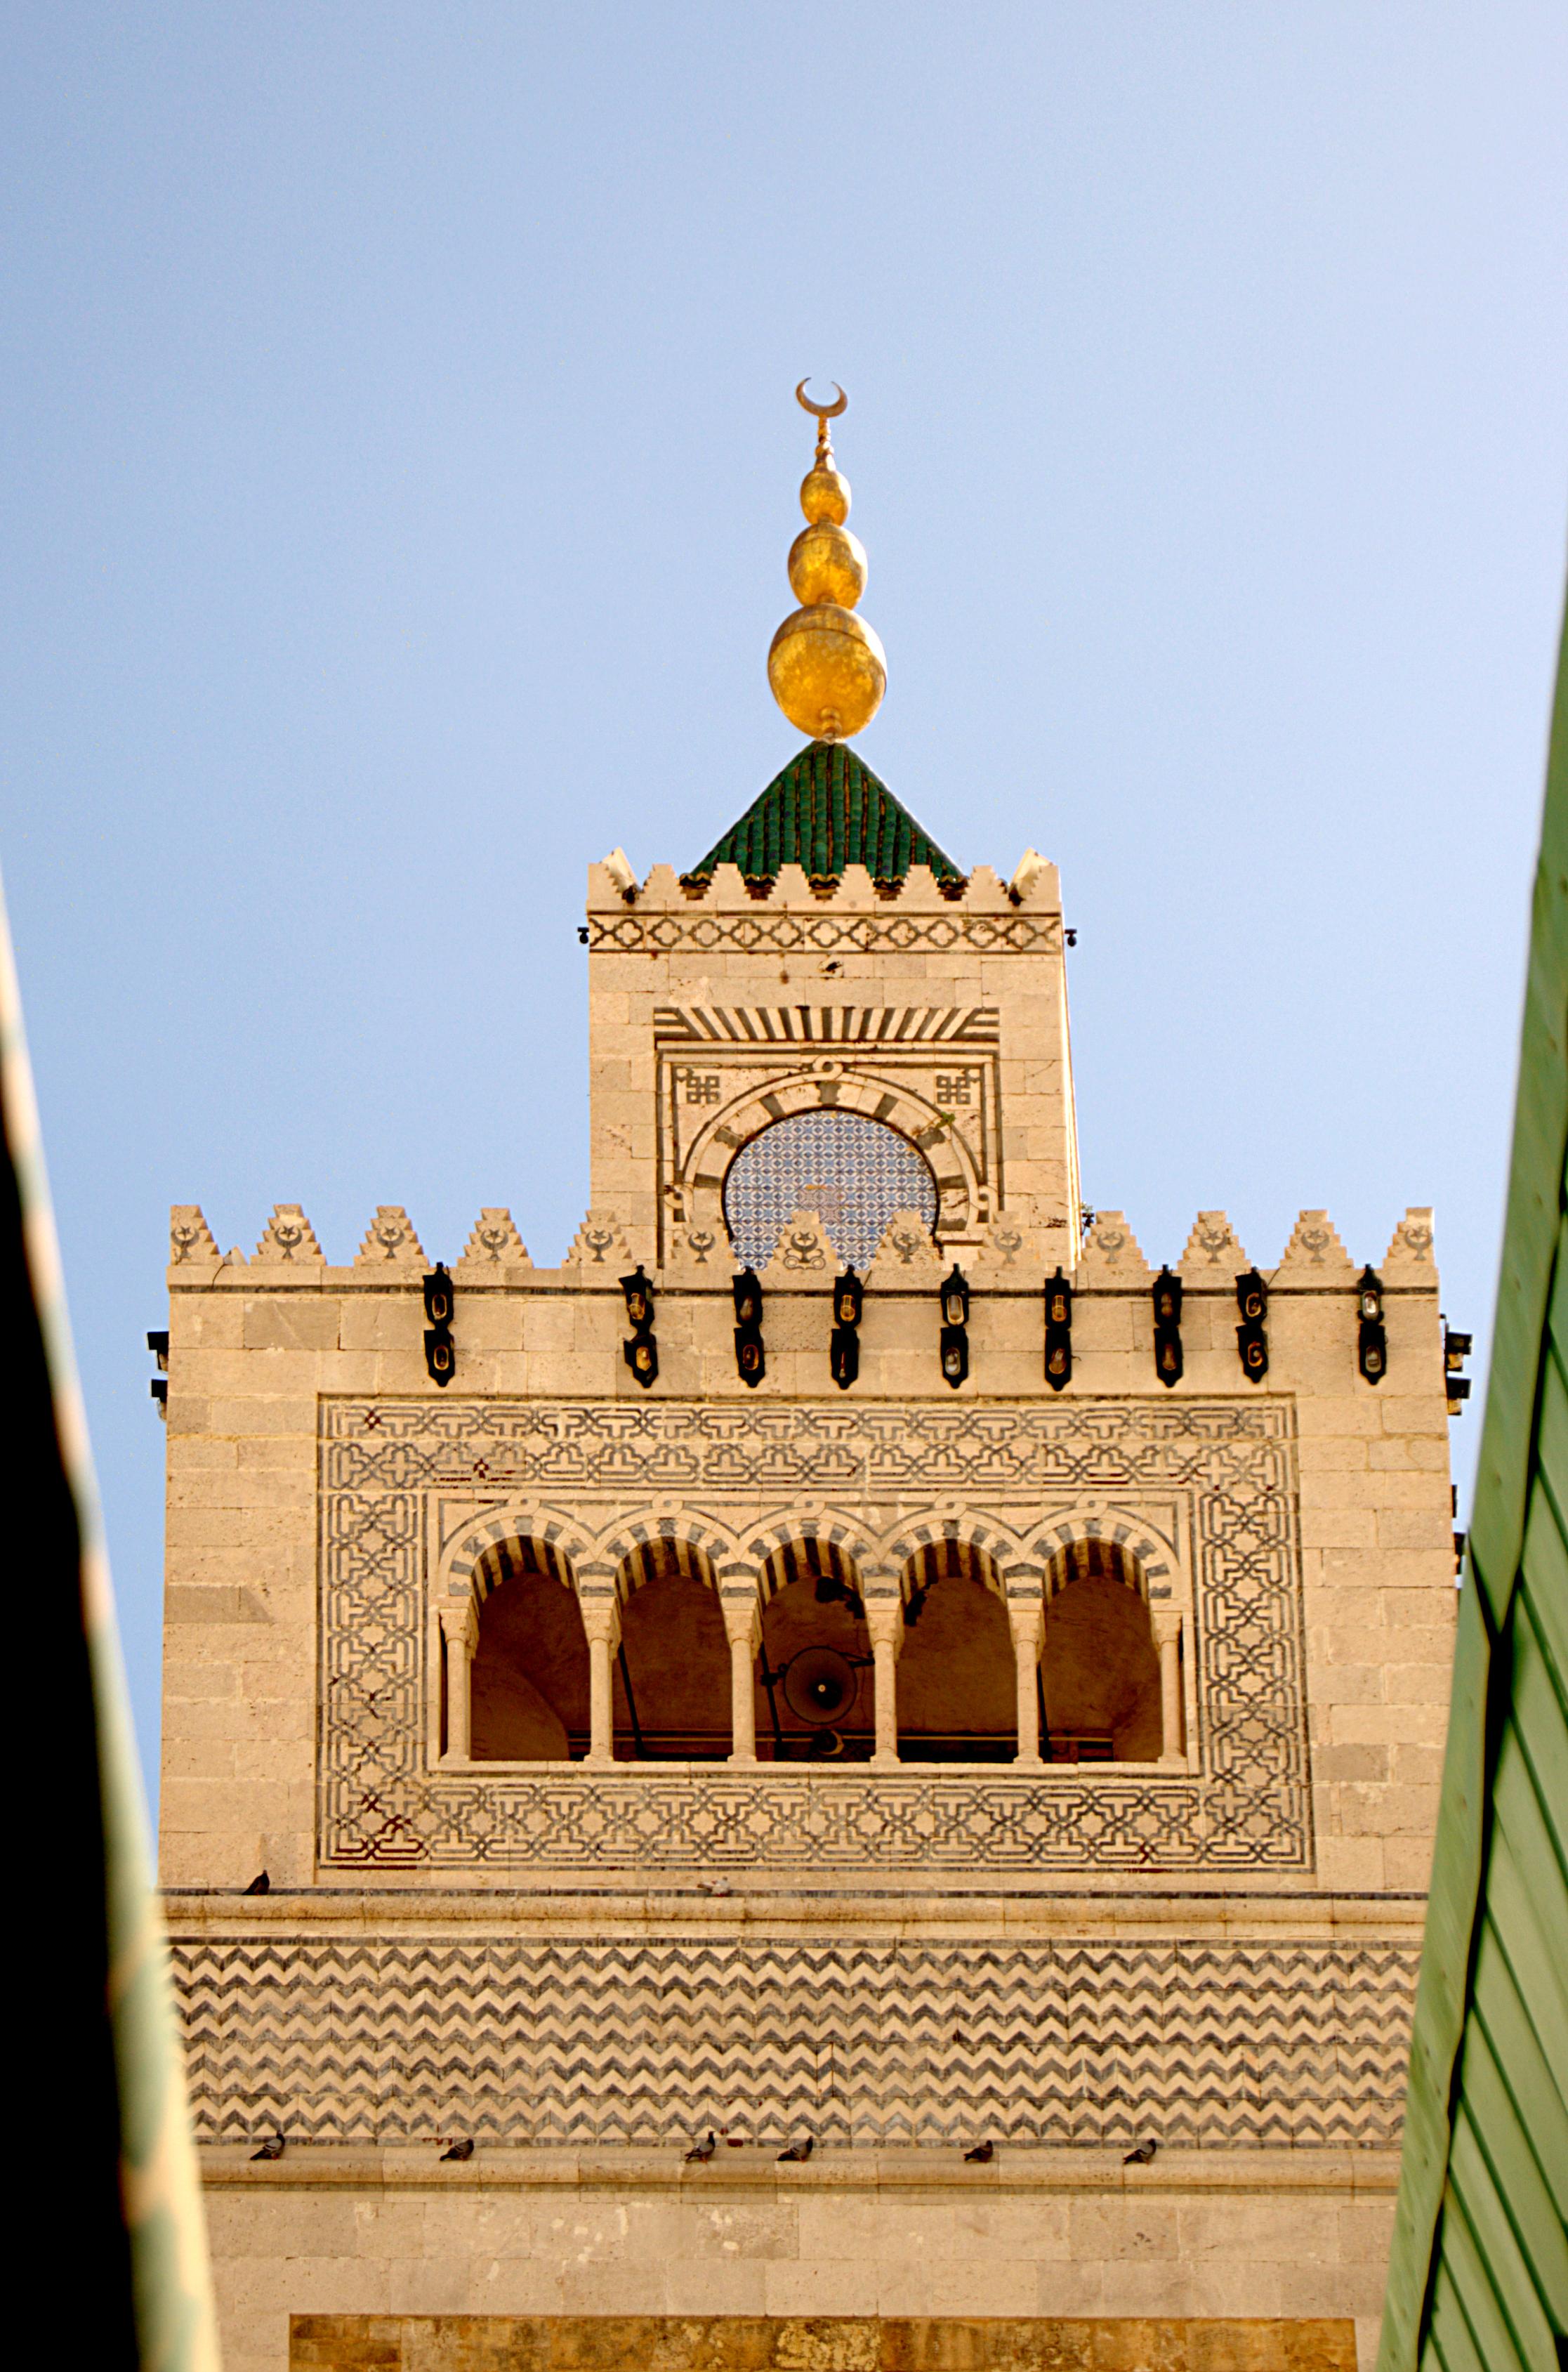 Minaret de la Mosquée de la Zitouna, Tunis, 21 septembre 2013, (09).jpg